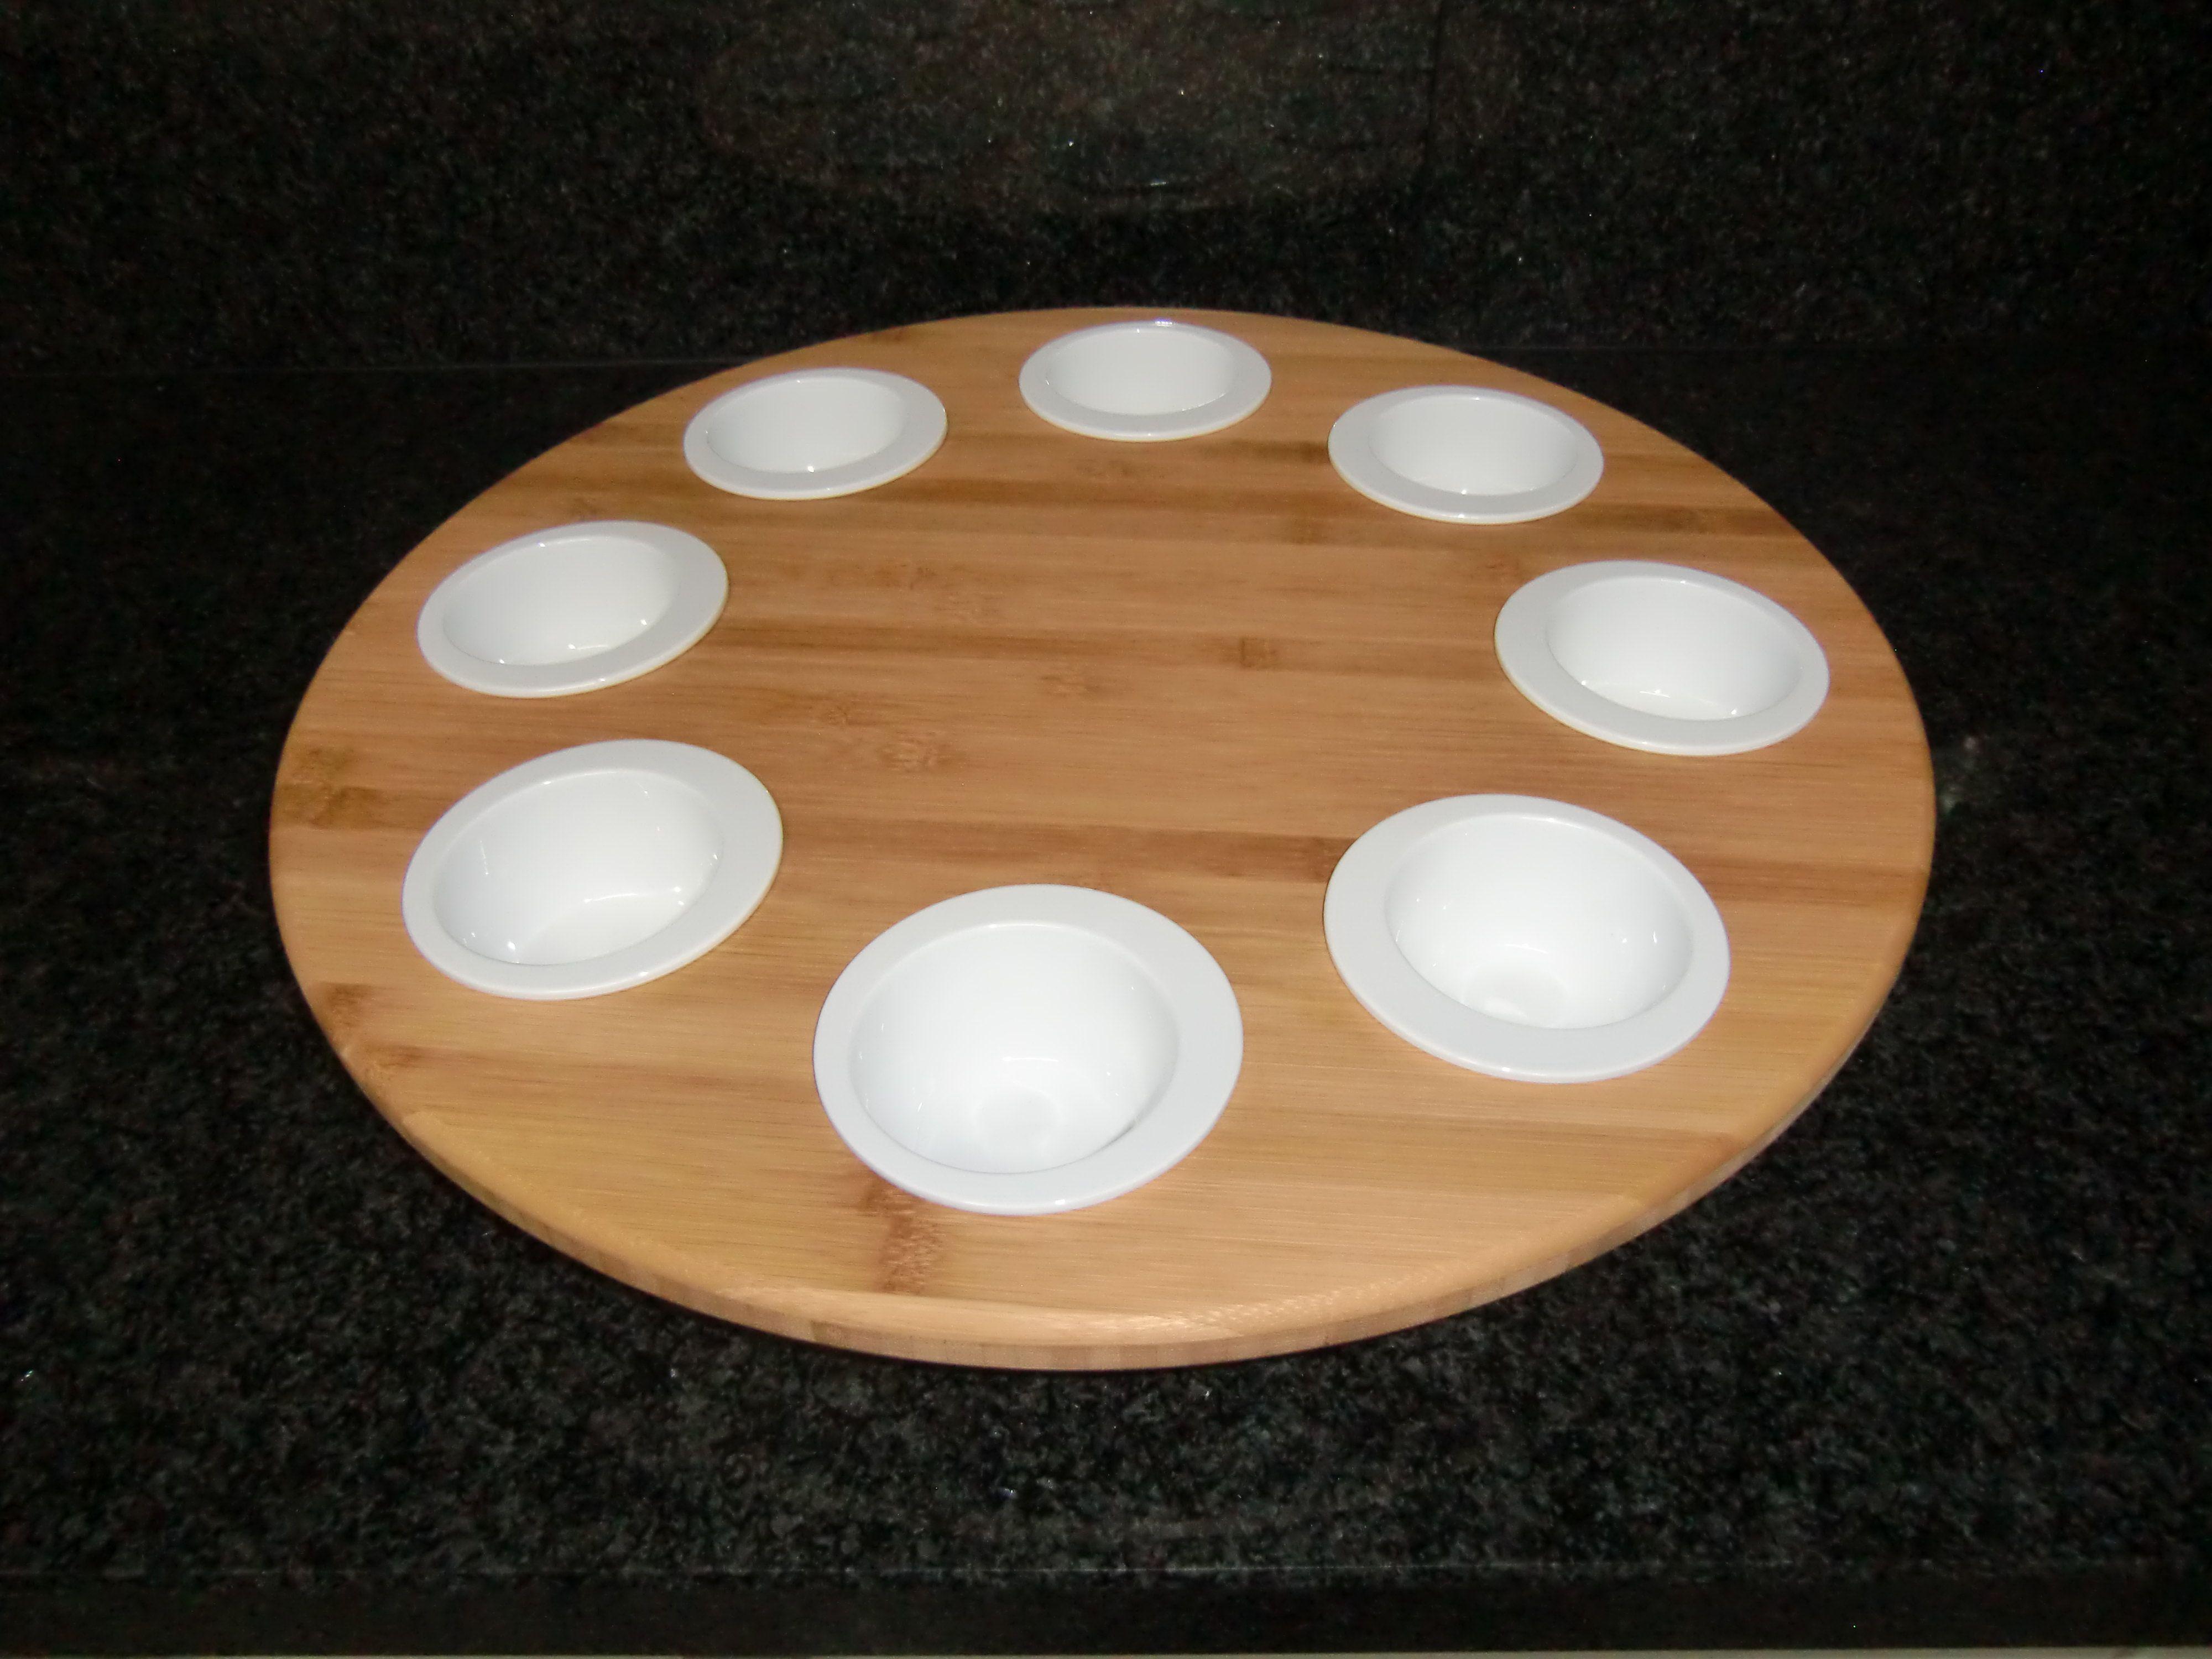 Drehteller Fur Tisch